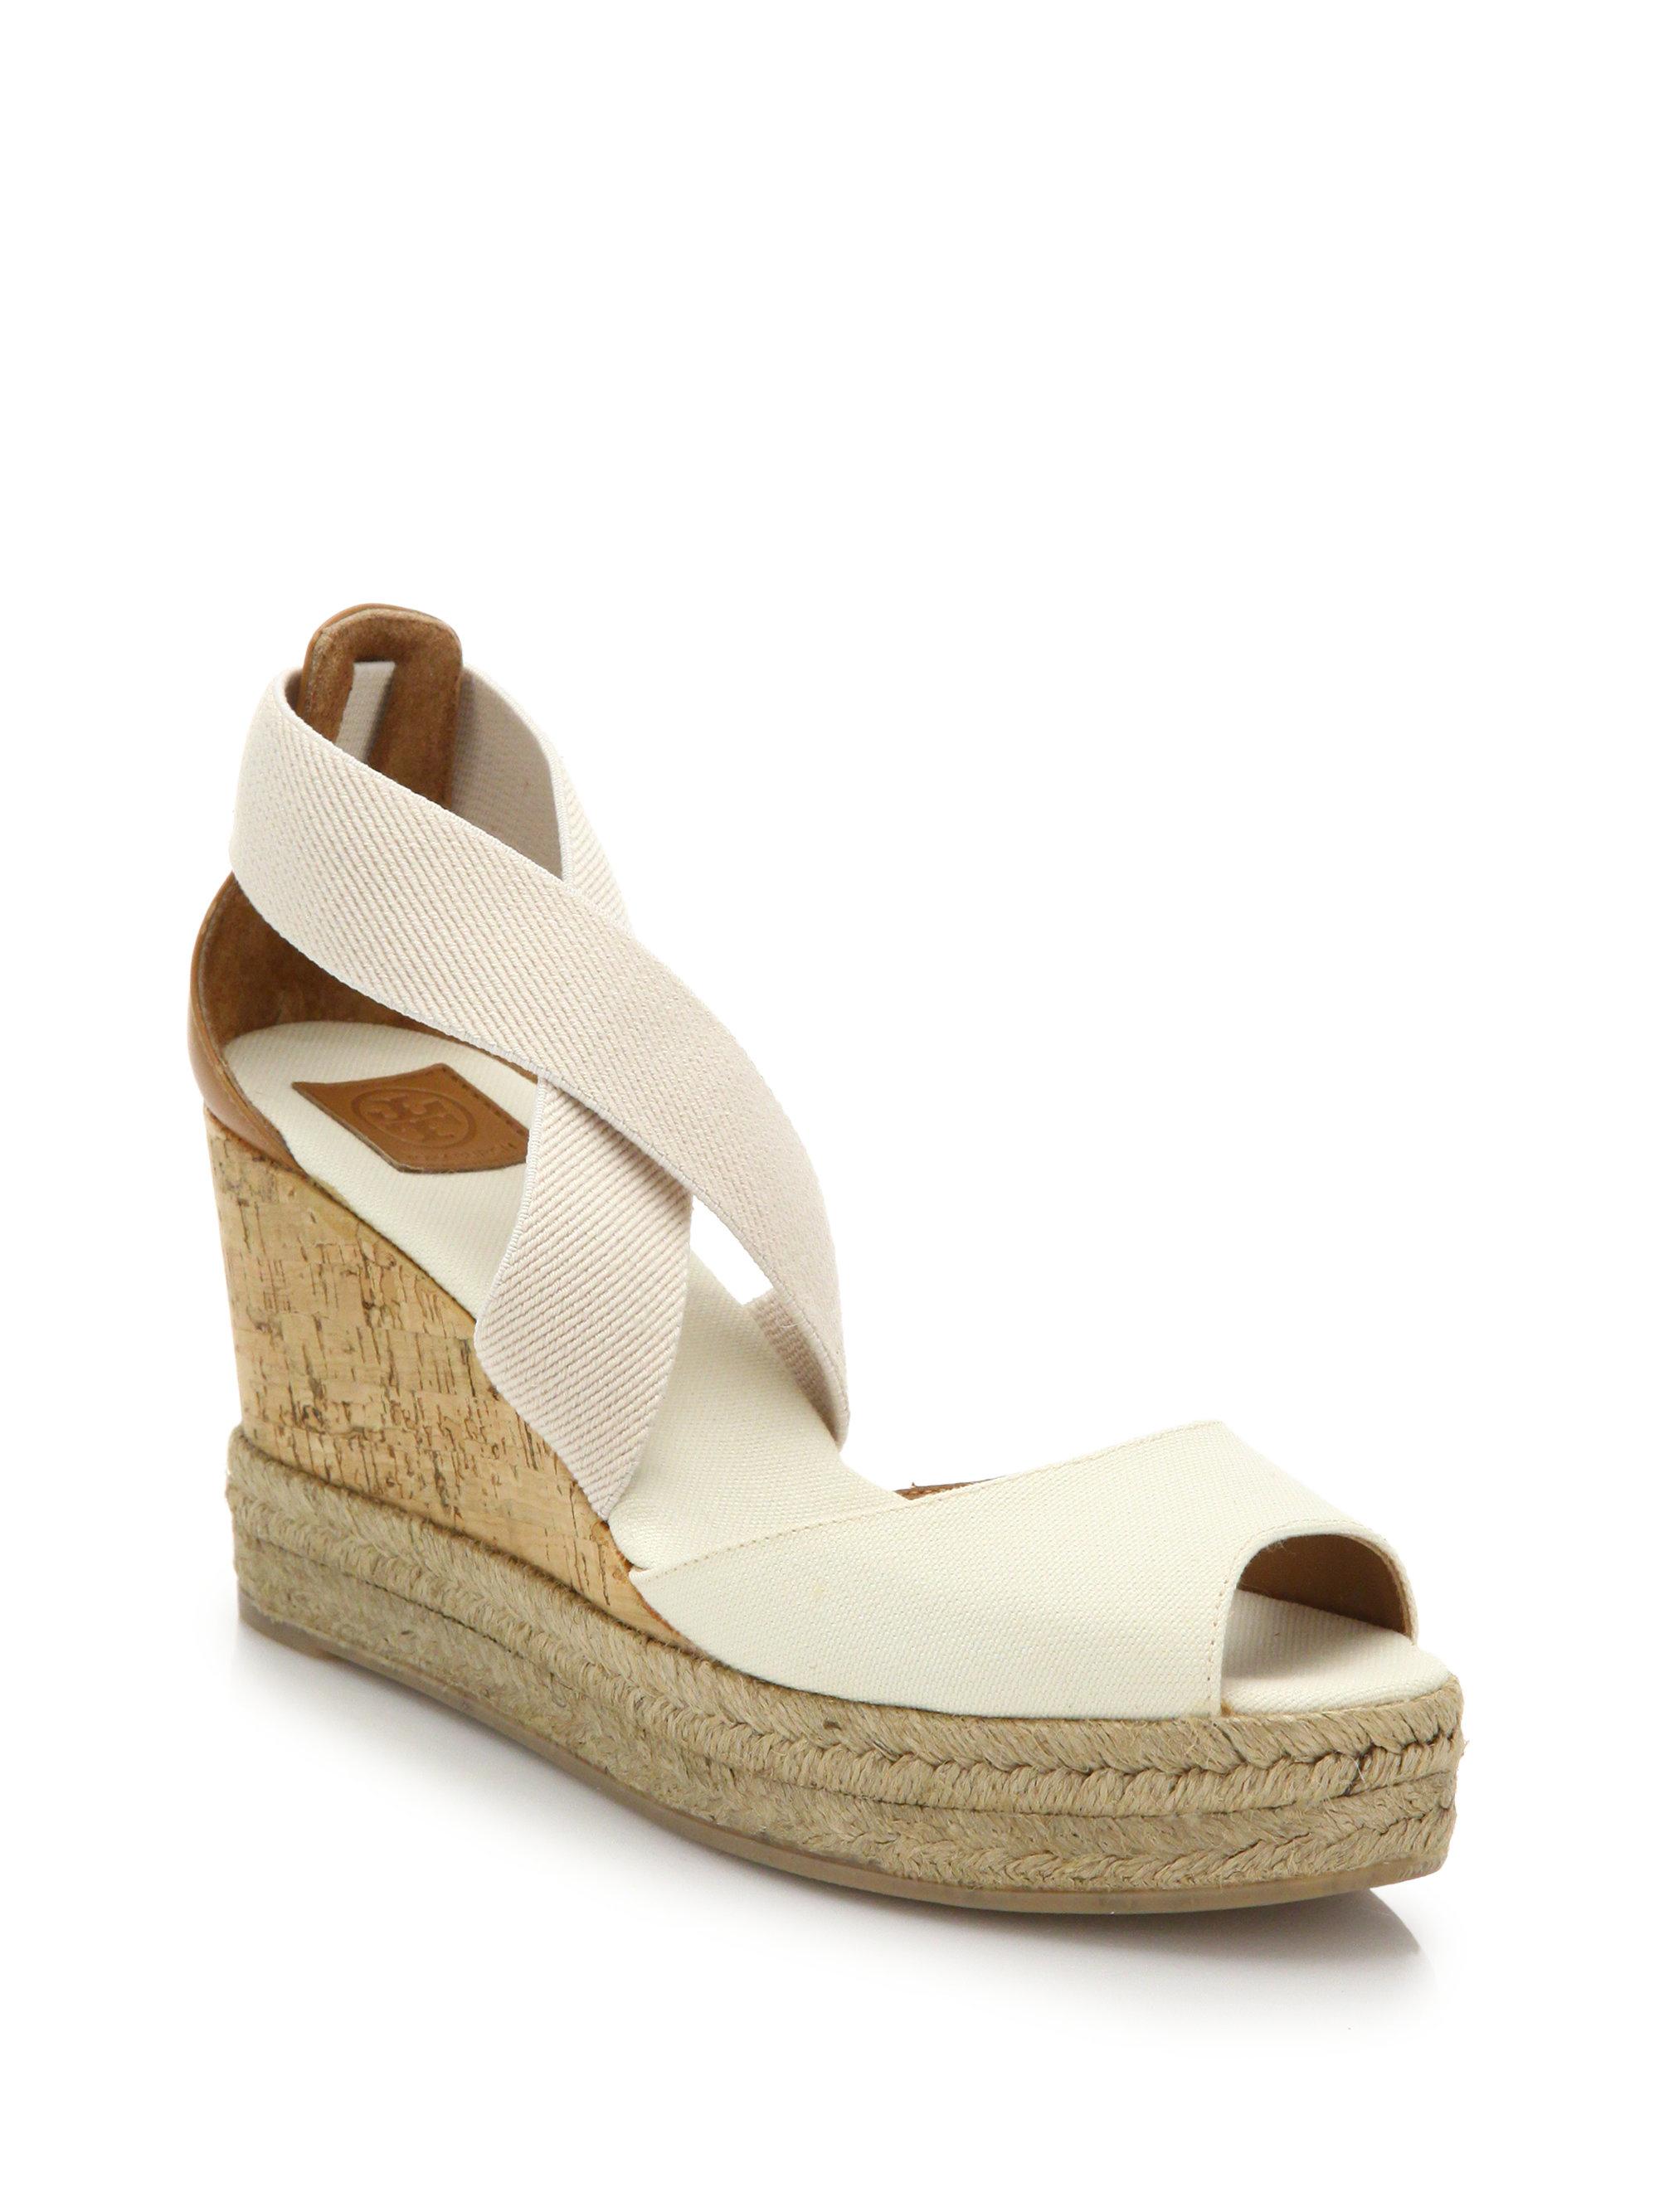 6df471f6b250b0 Lyst - Tory Burch Canvas   Cork Espadrille Wedge Sandals in White